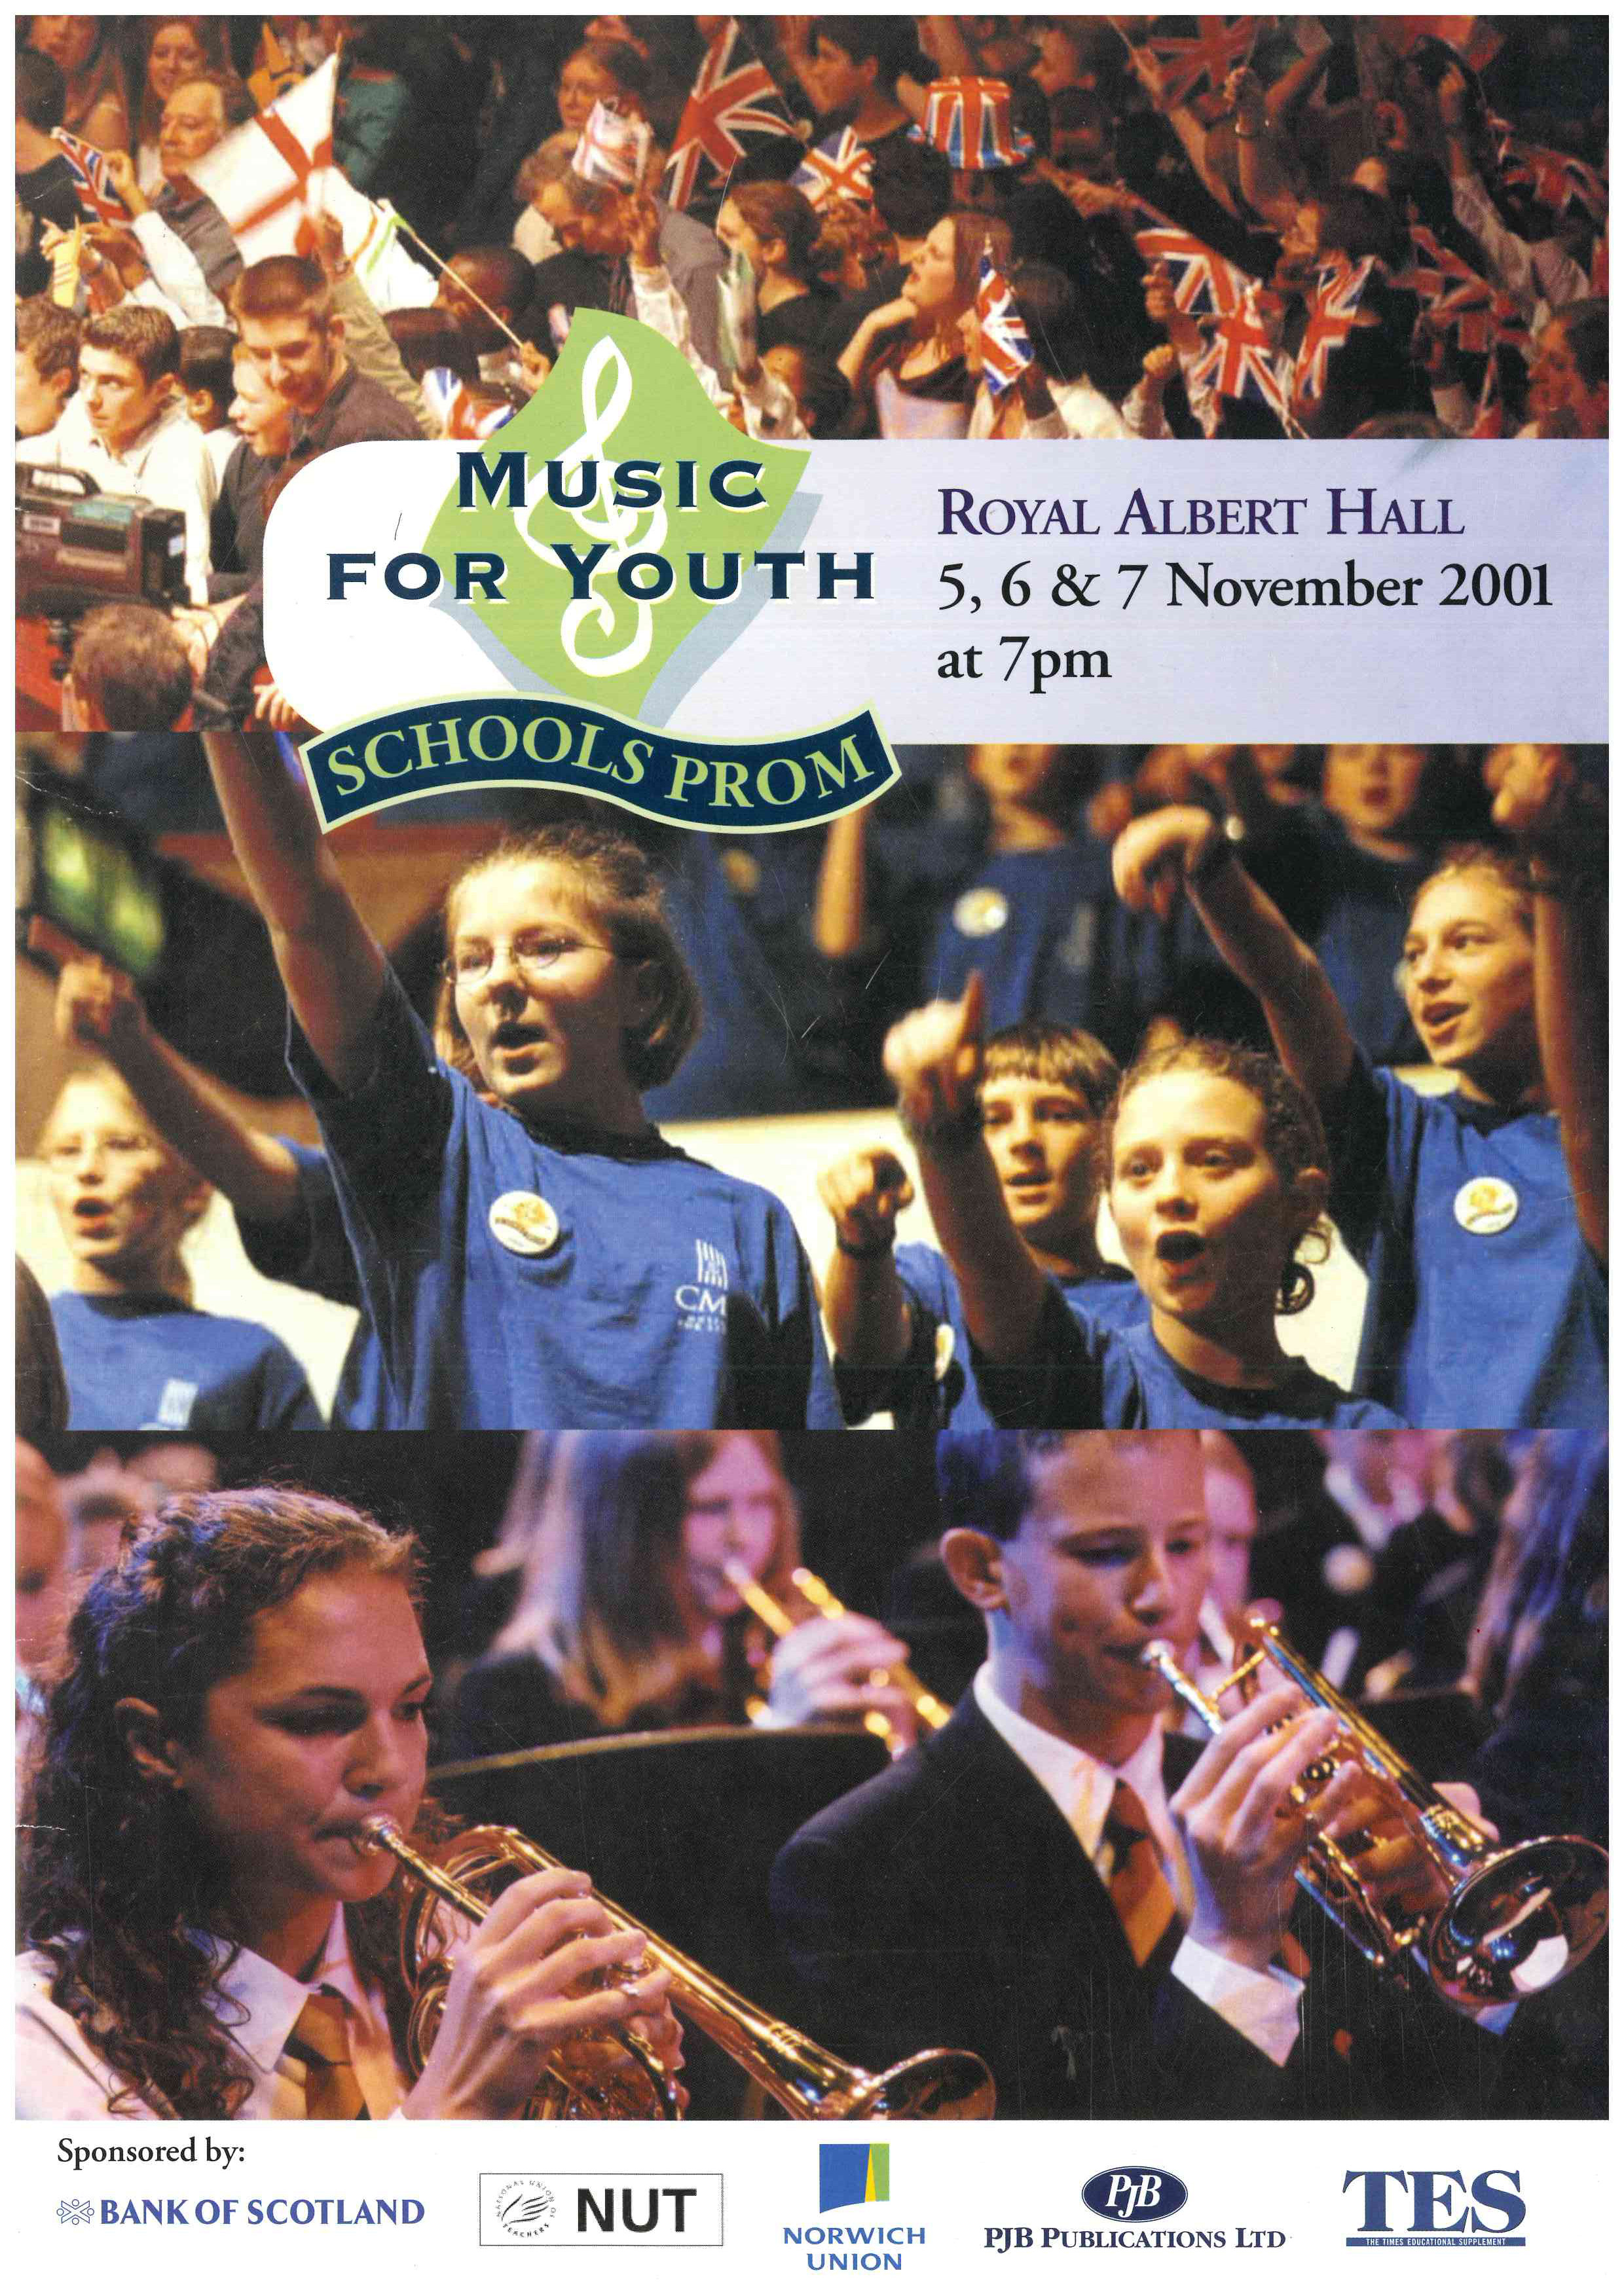 00350-Schools Prom, November 2001.jpg